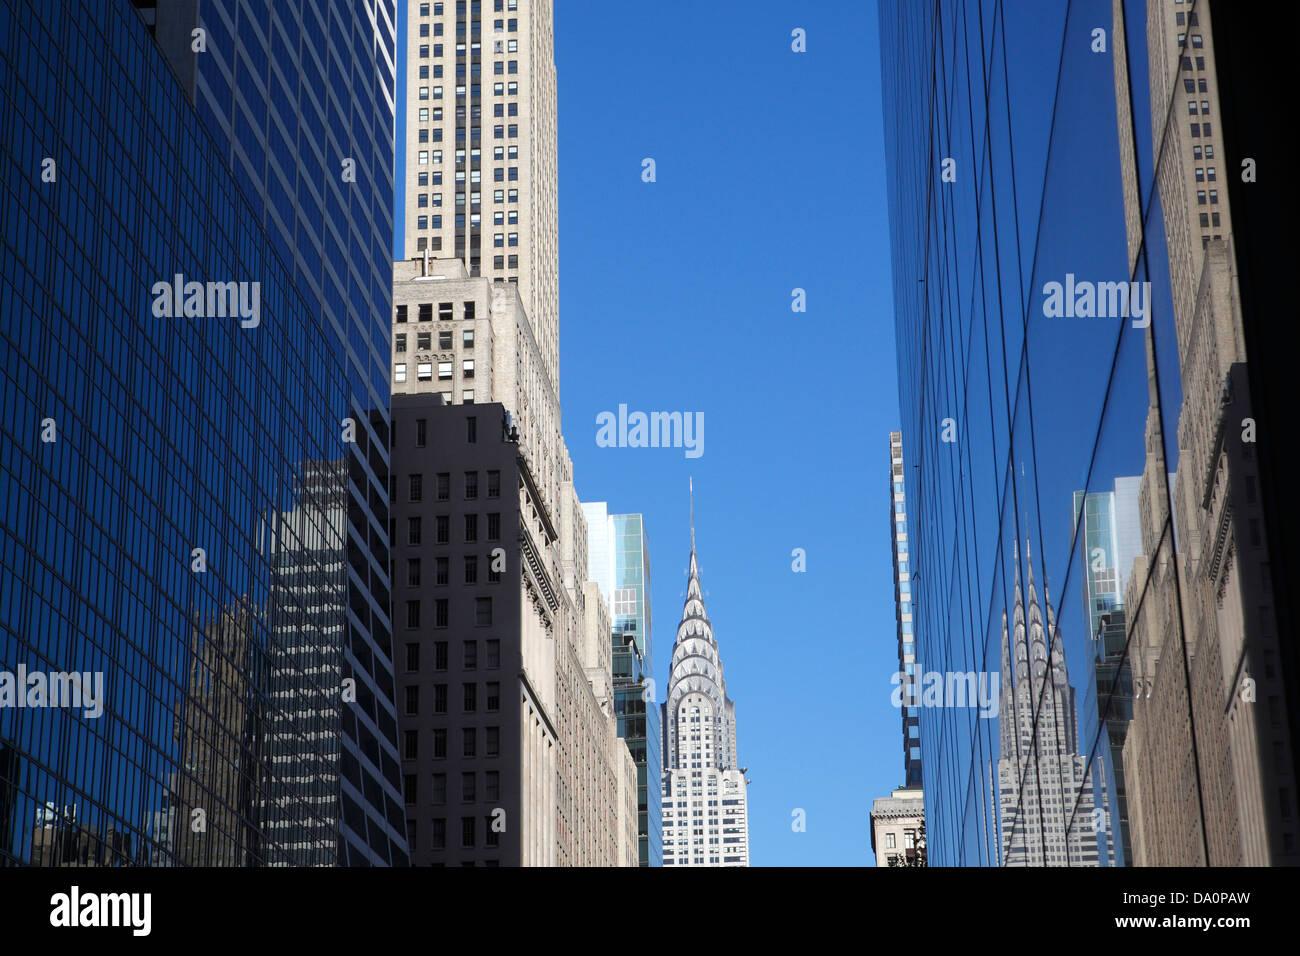 Chrysler building New York City - Stock Image